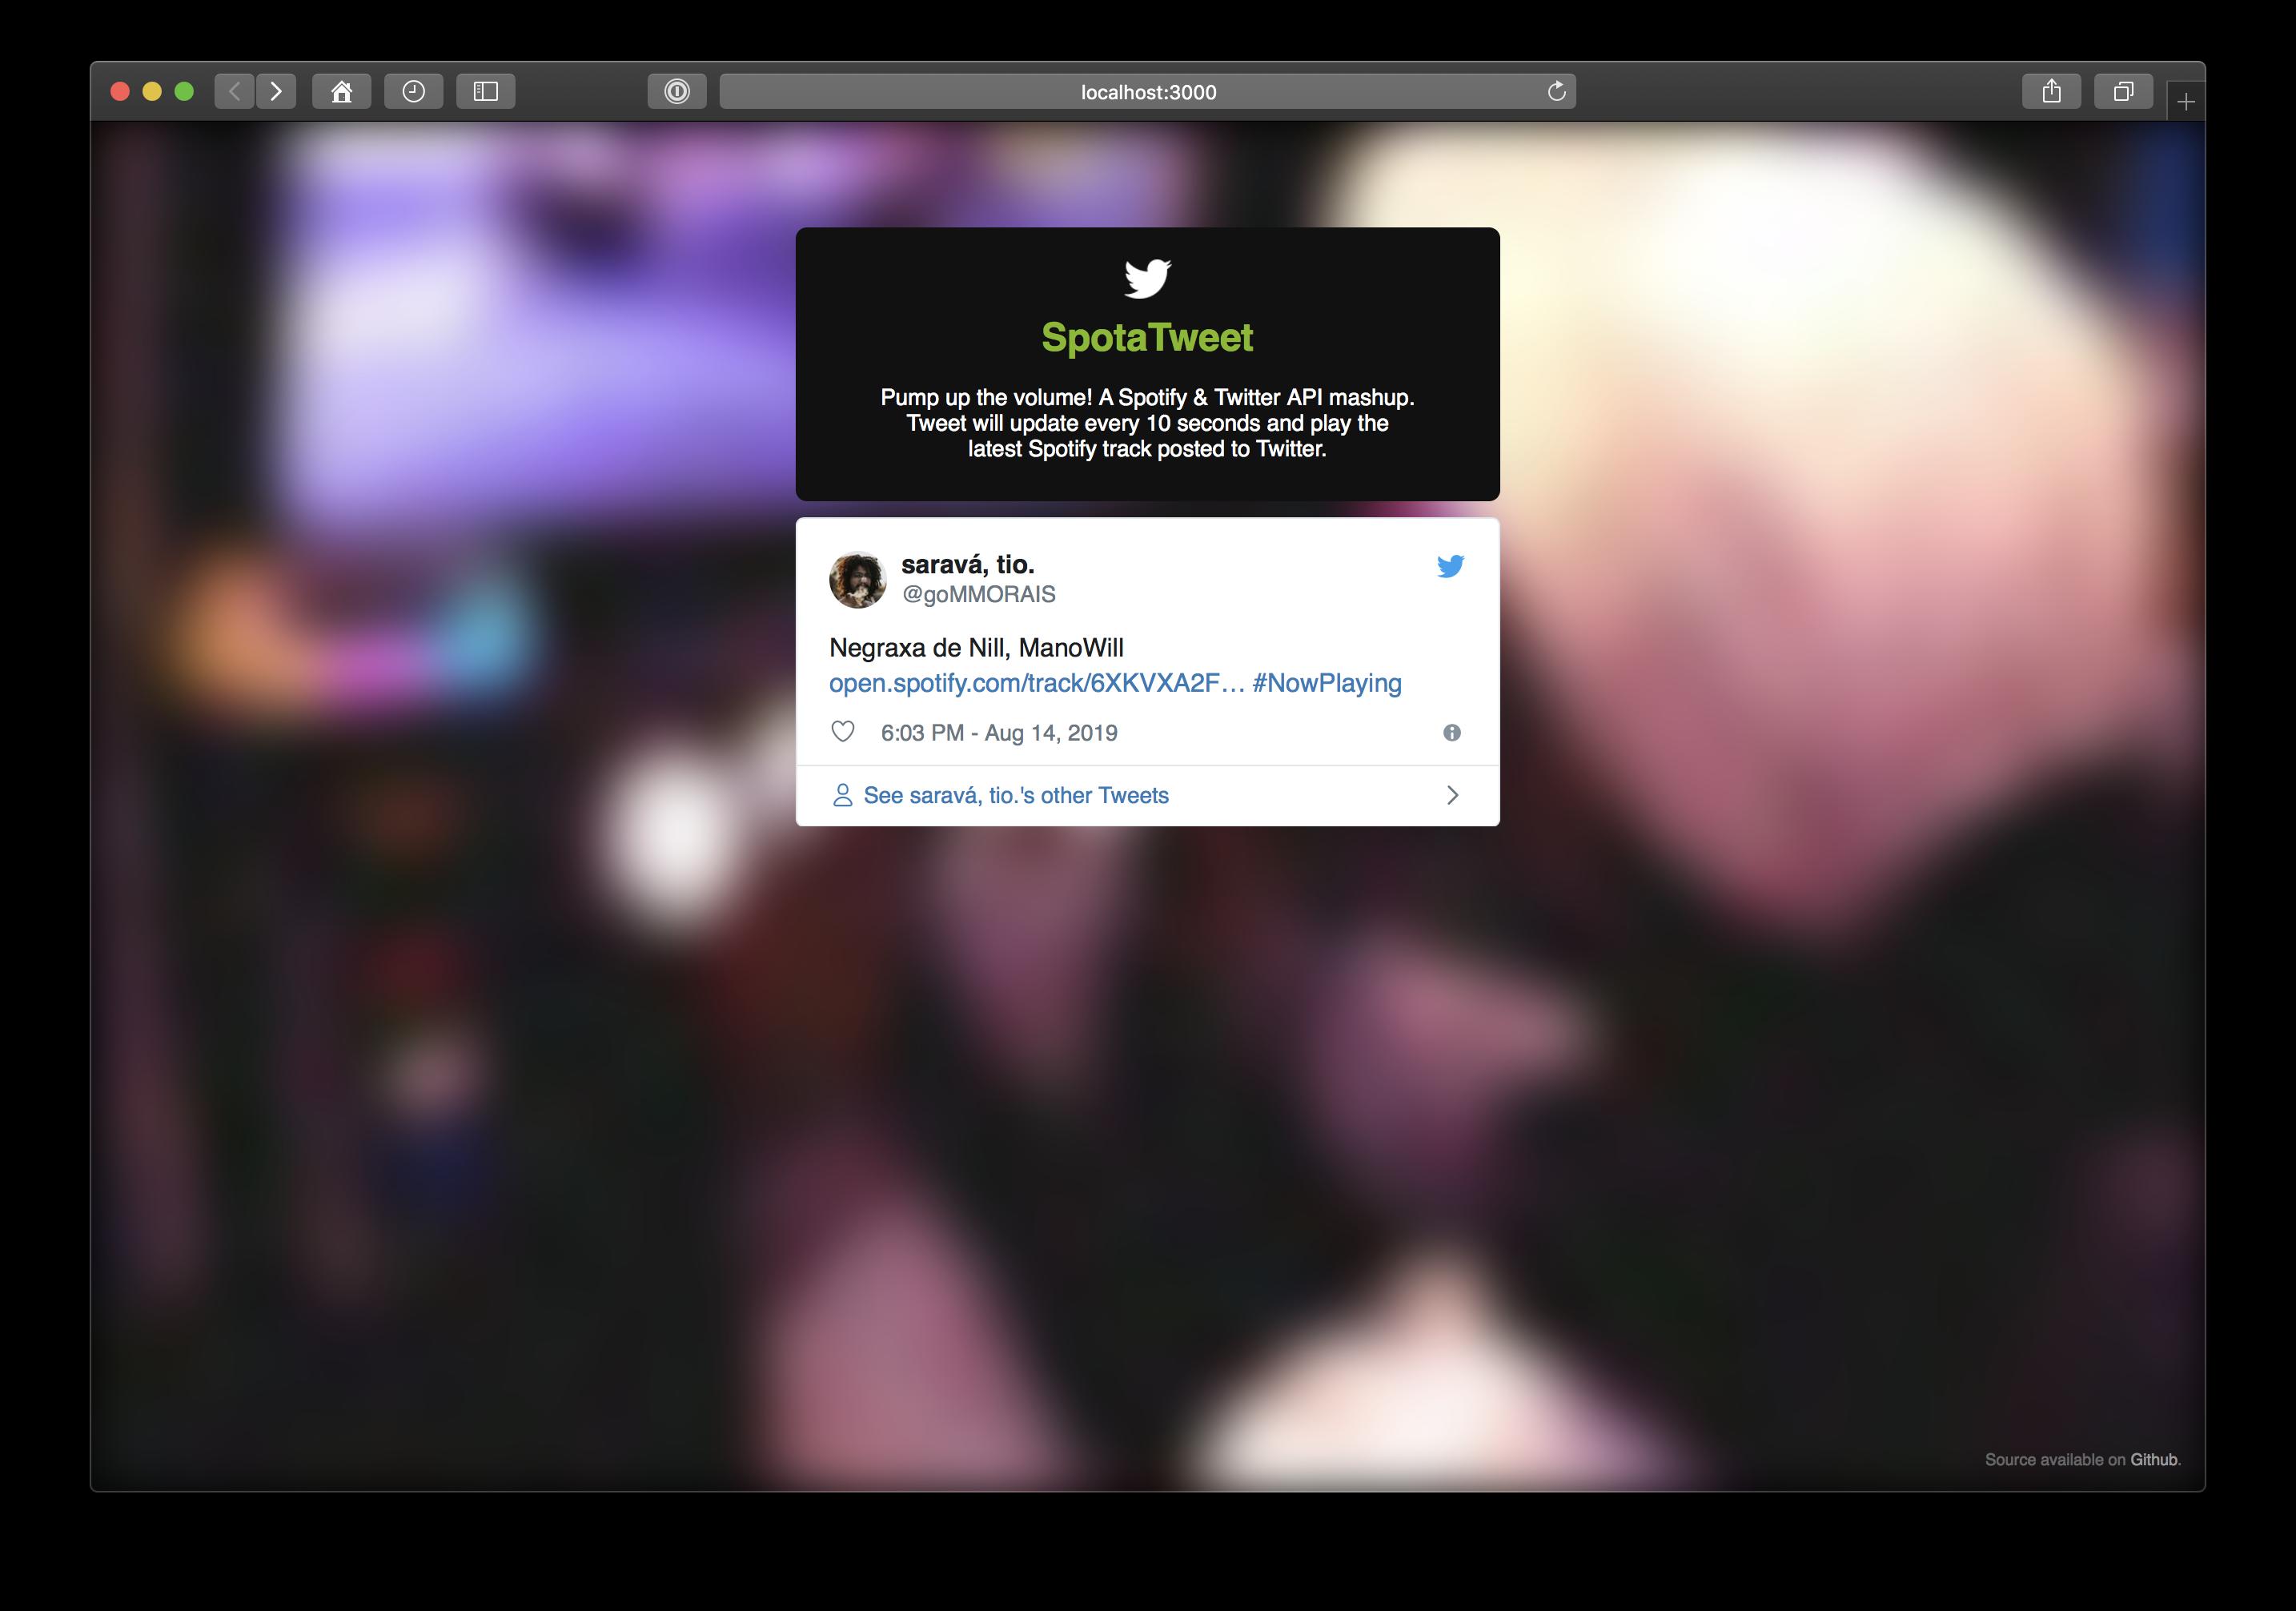 TwitterDev Gallery